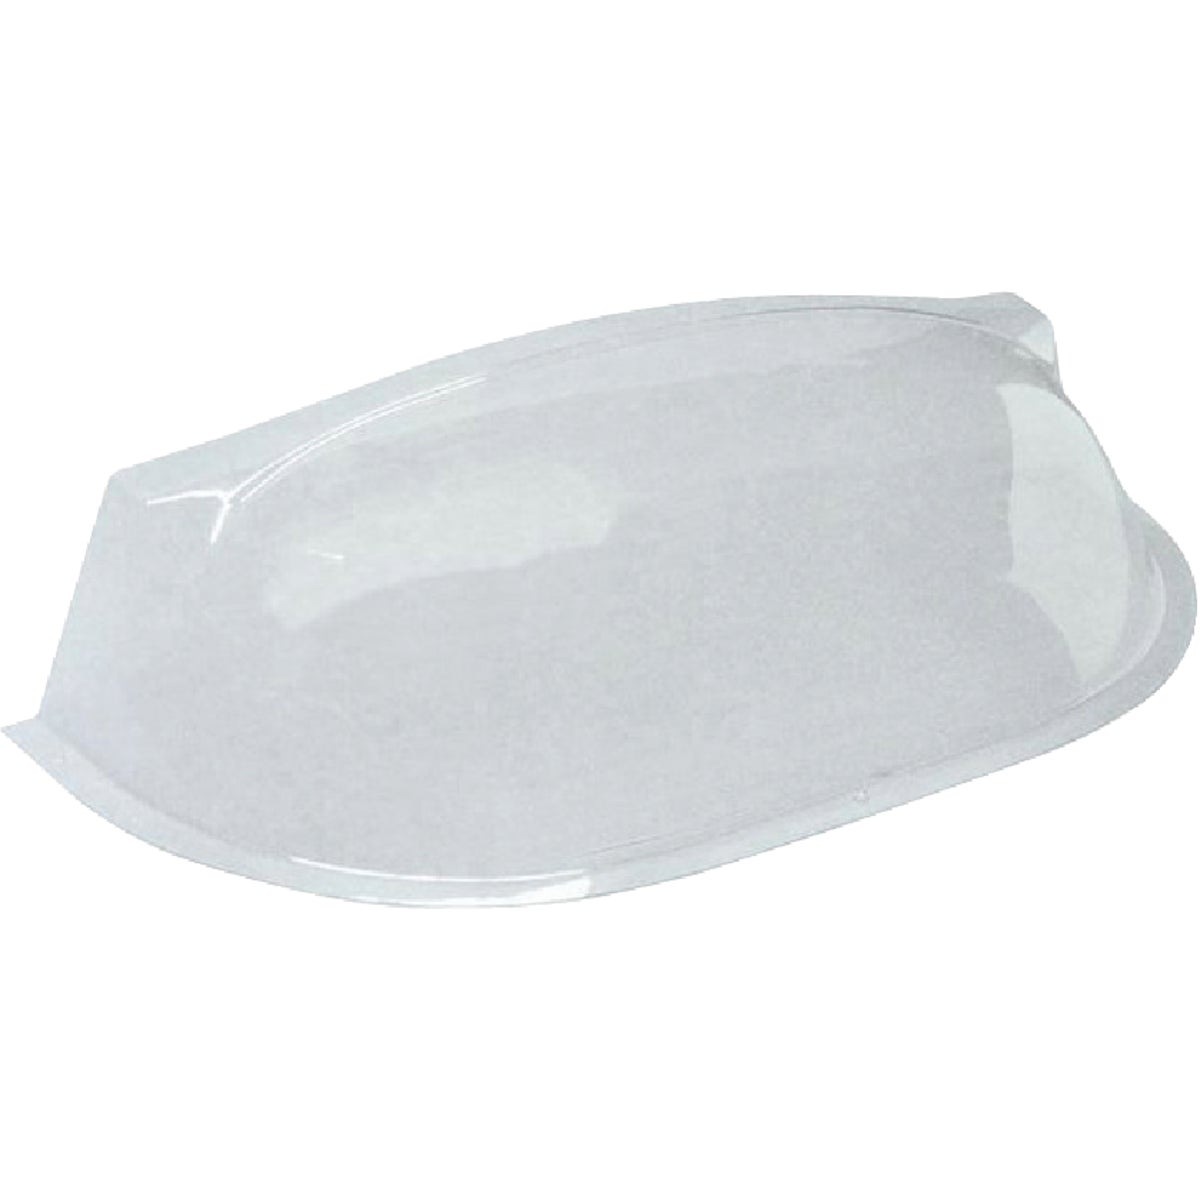 40 In. x 18-1/2 In. Circular Plastic Window Well Cover